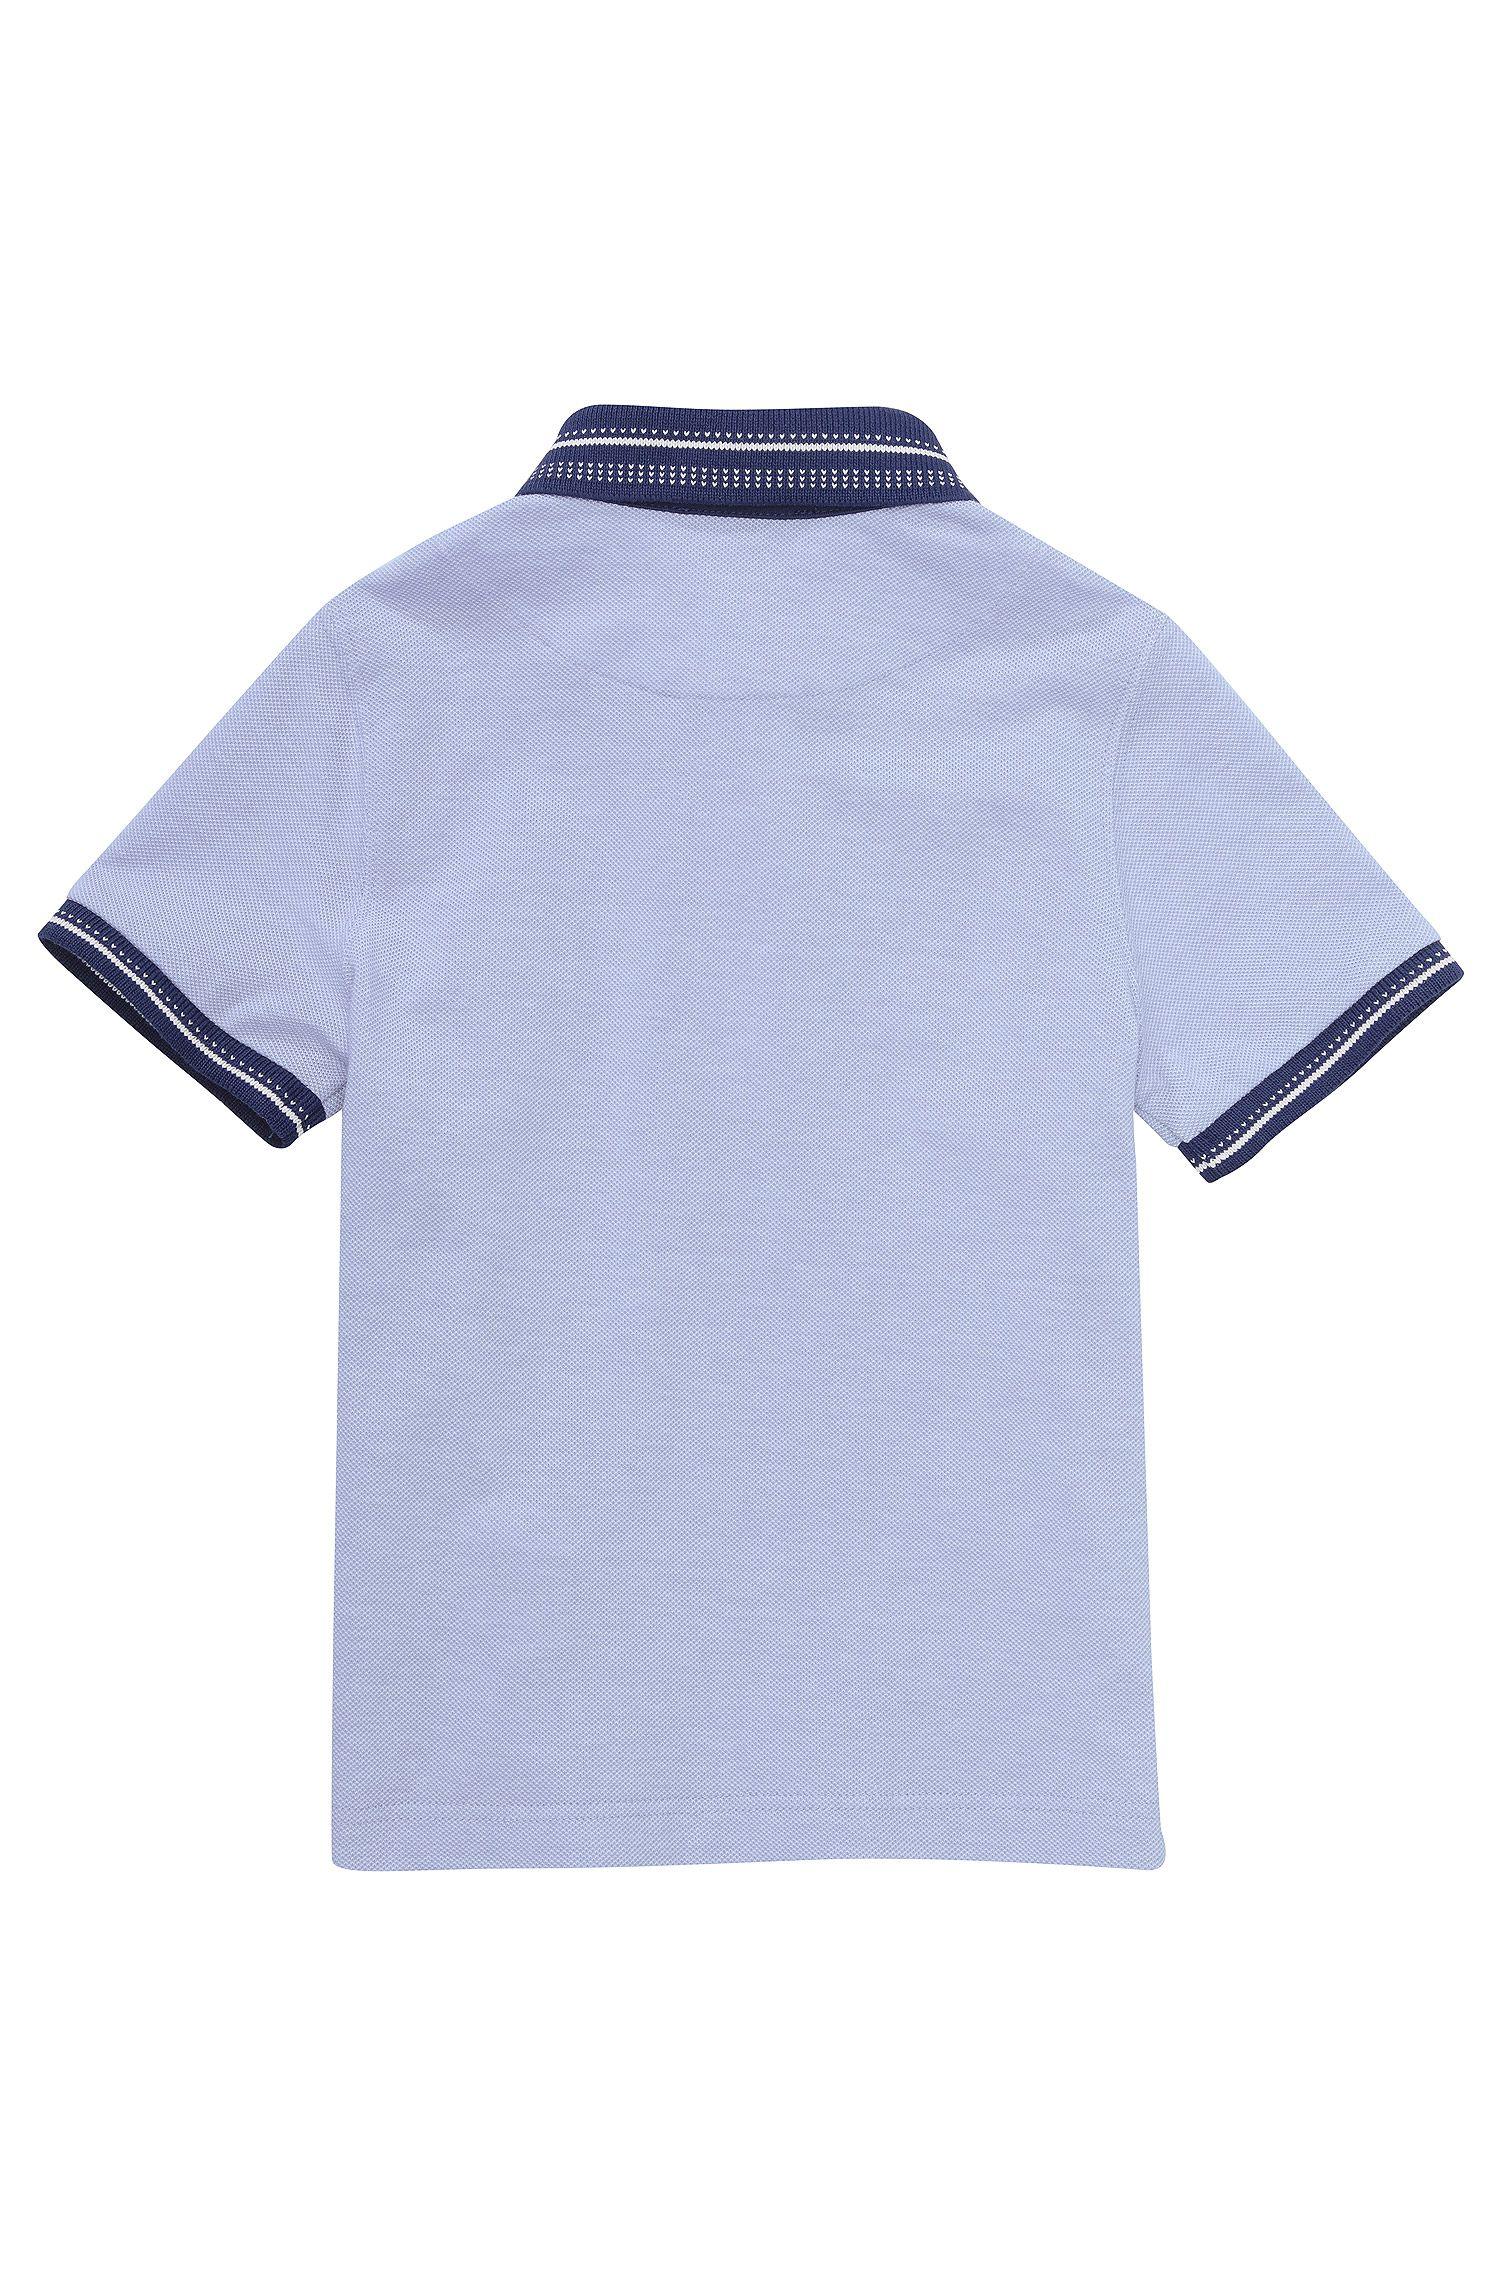 Kids-Piqué-Polo ´J25777` aus Baumwolle